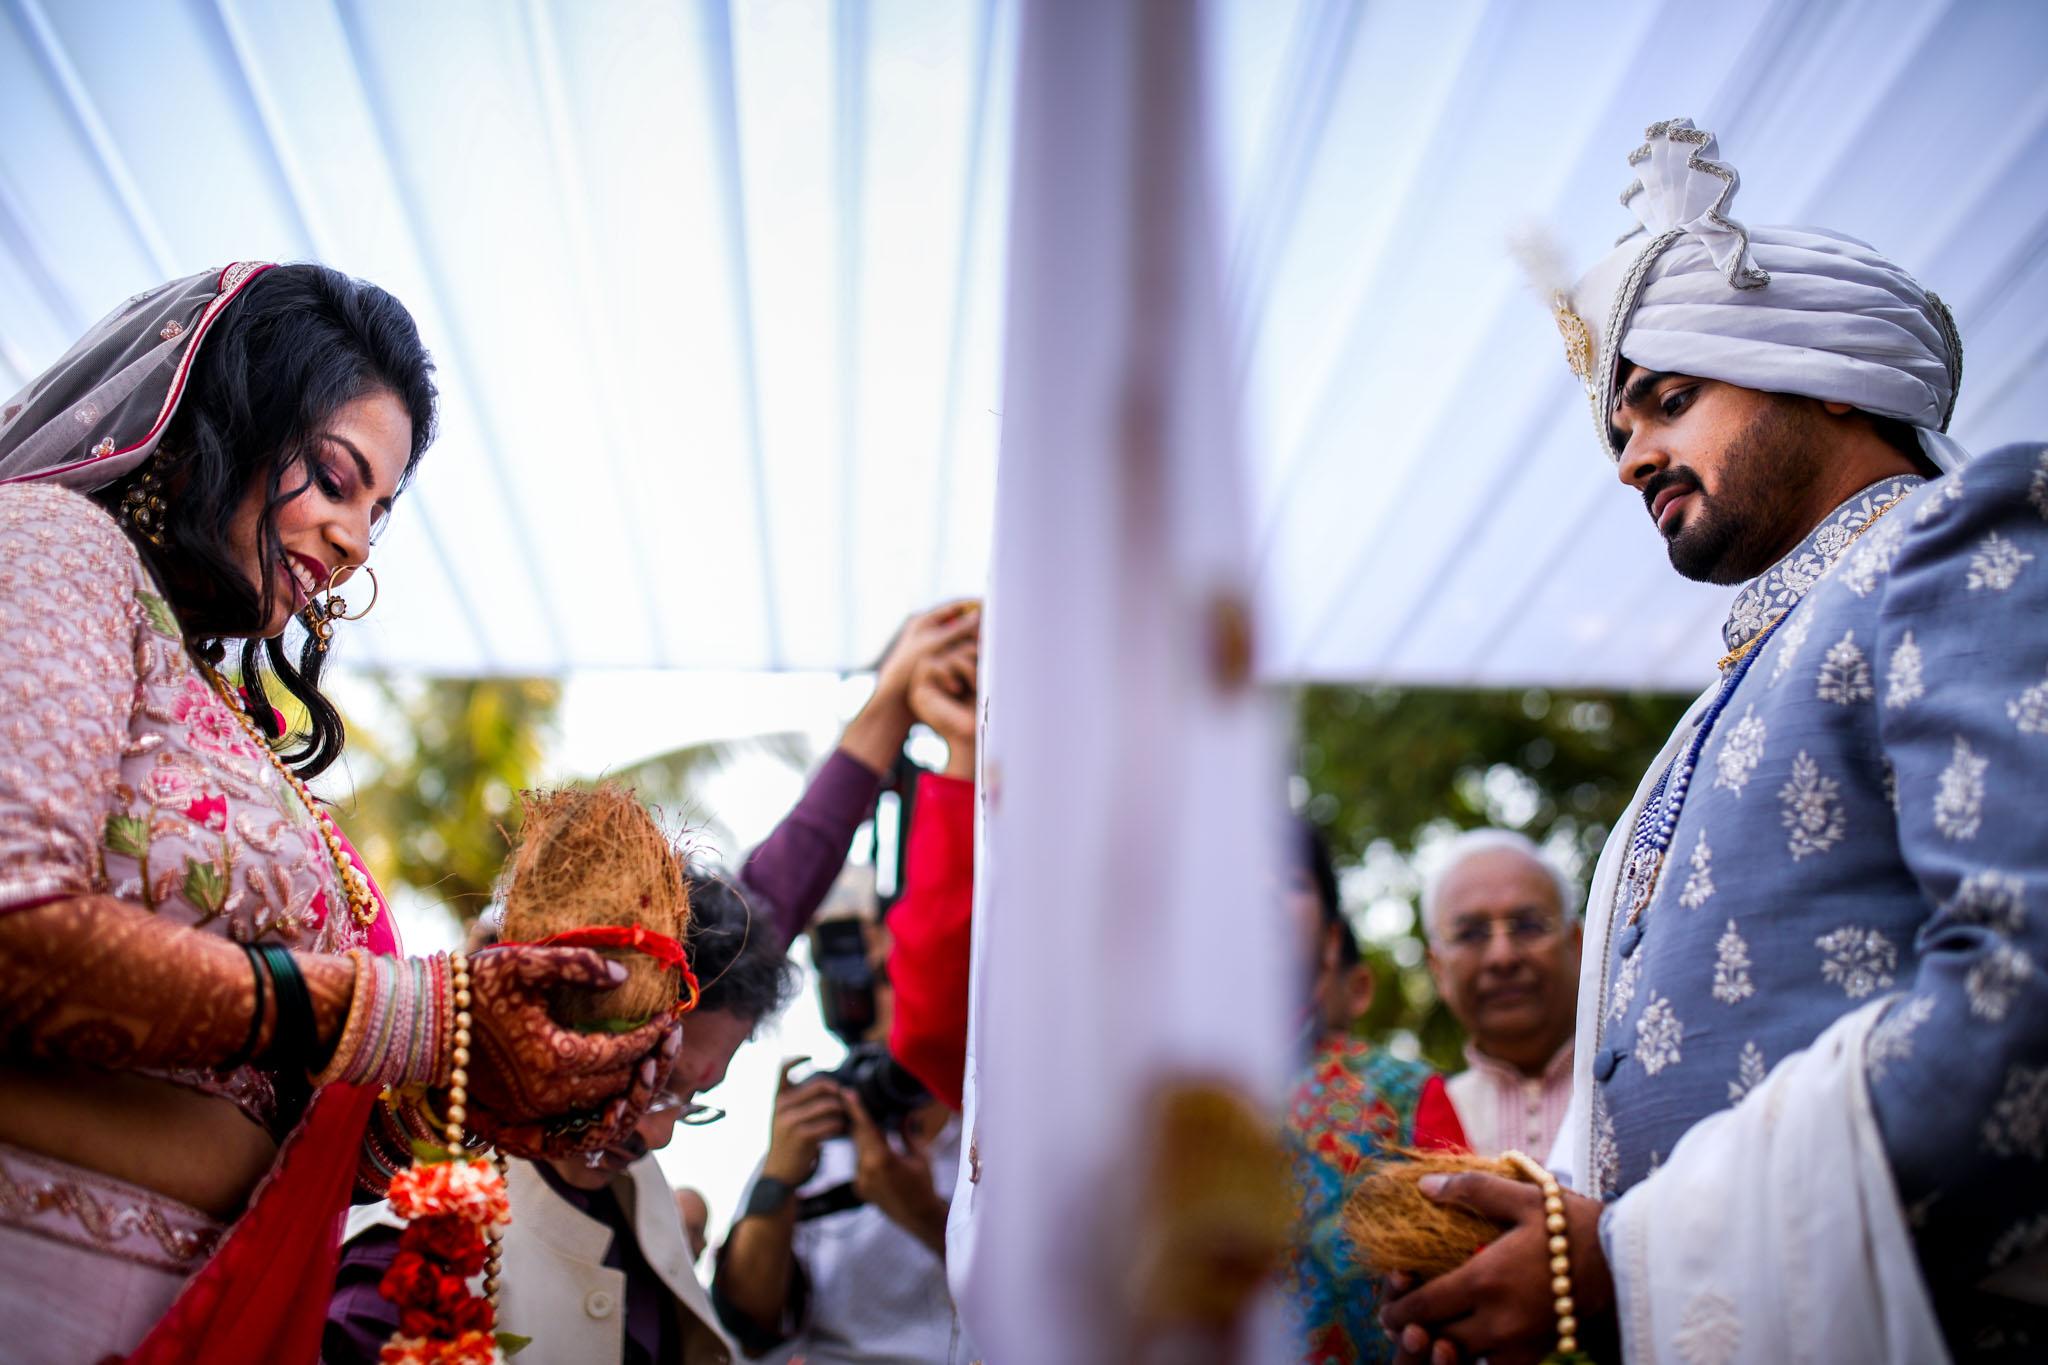 Mukti x Ojas Wedding Akshjay Sansare Photography Best wedding photographer in mumbai India Candid Cinematic Films videos-30.jpg